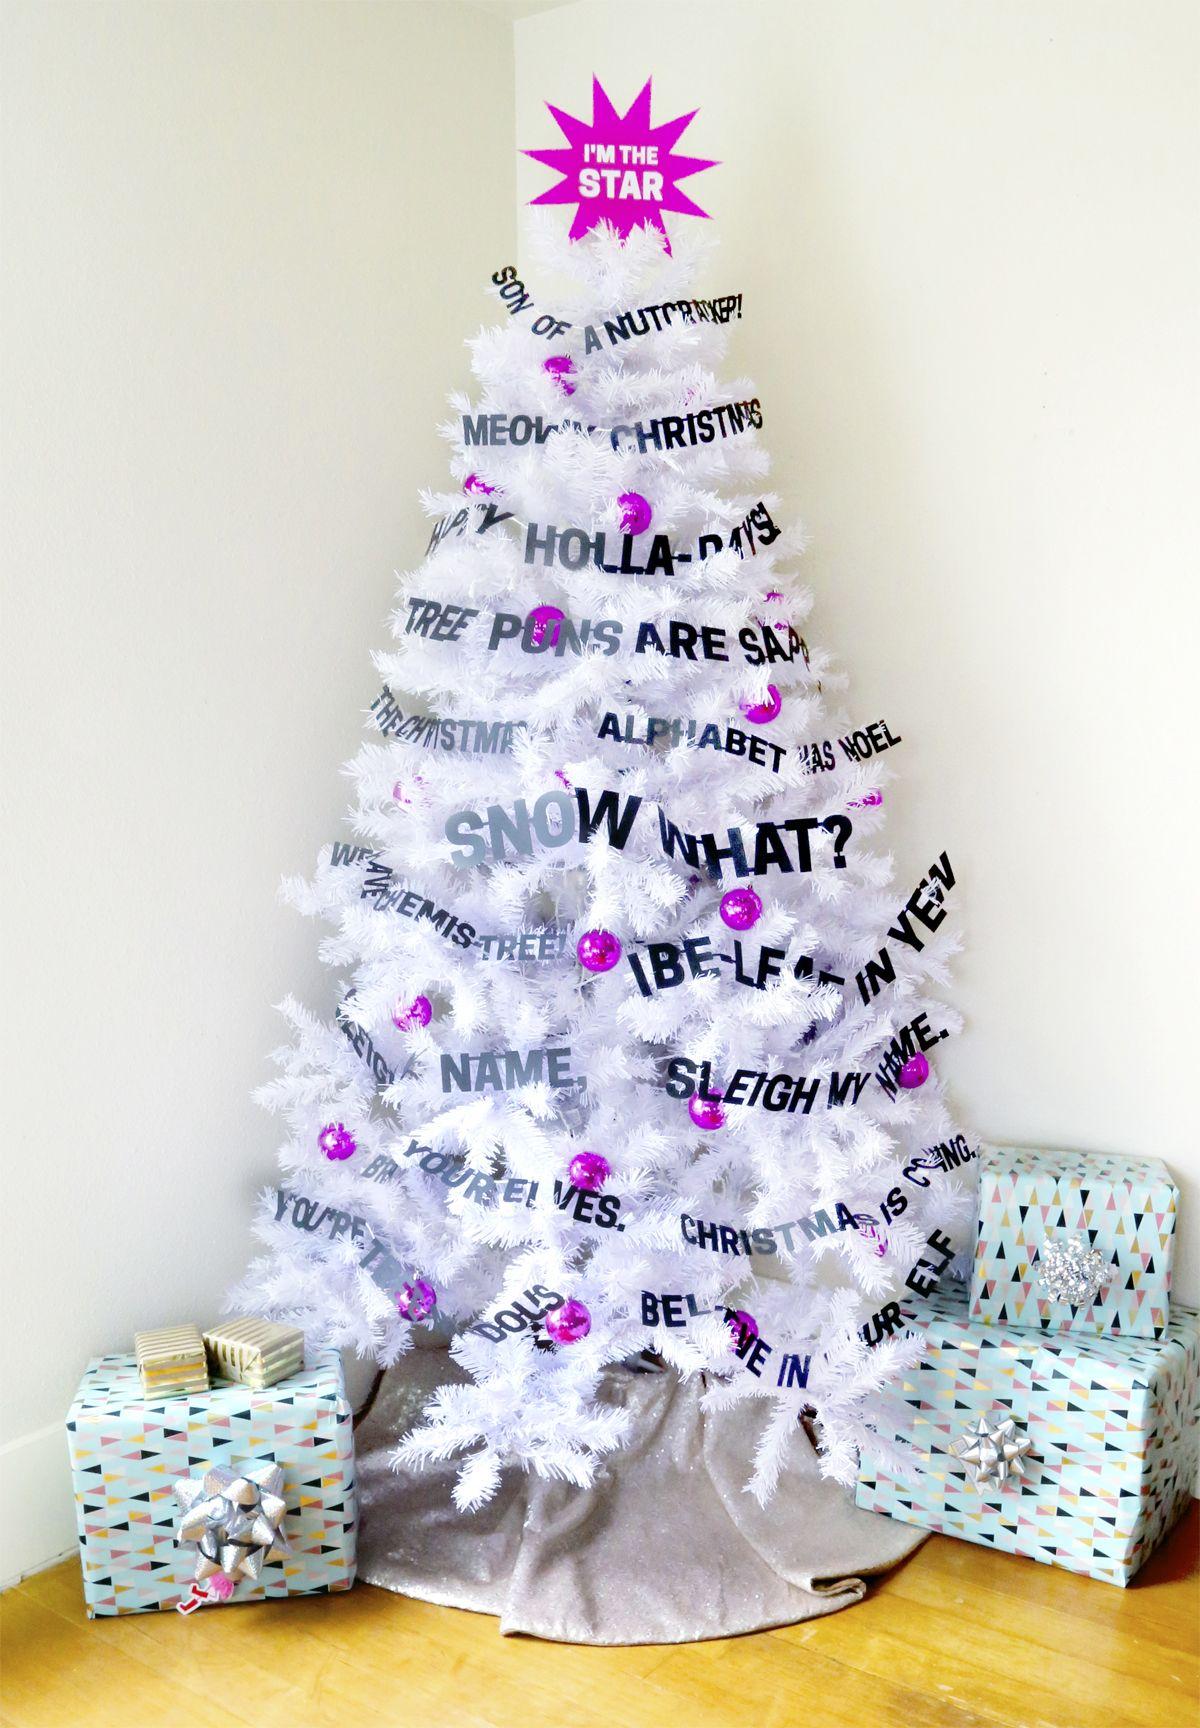 Day 3 of my 50 DIY Days of Christmas: Punny Christmas Tree